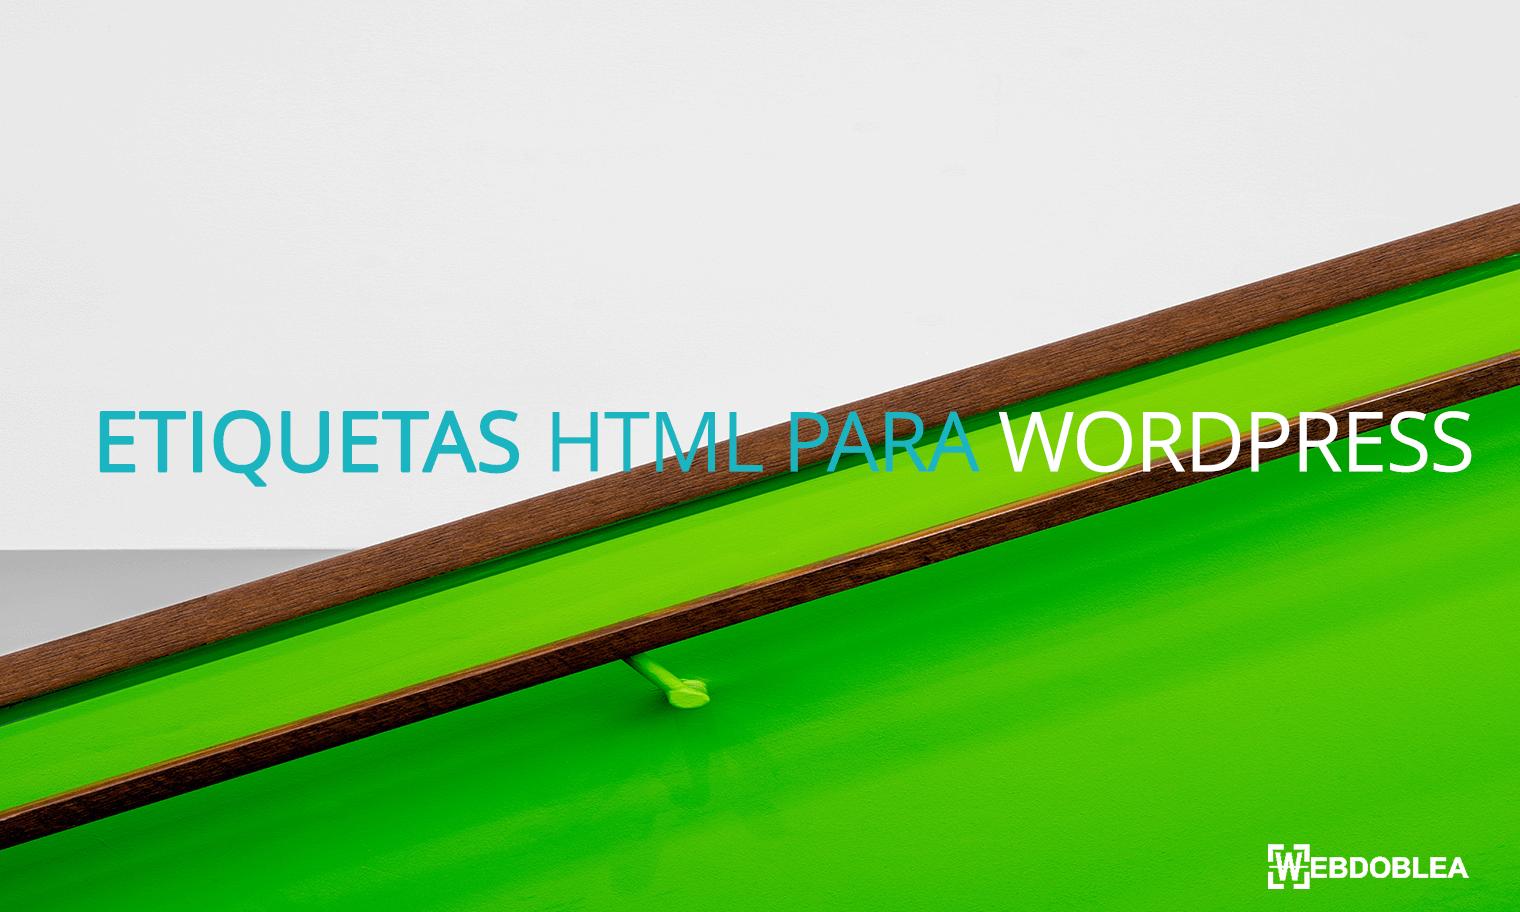 etiquetas_html_para_wordpress